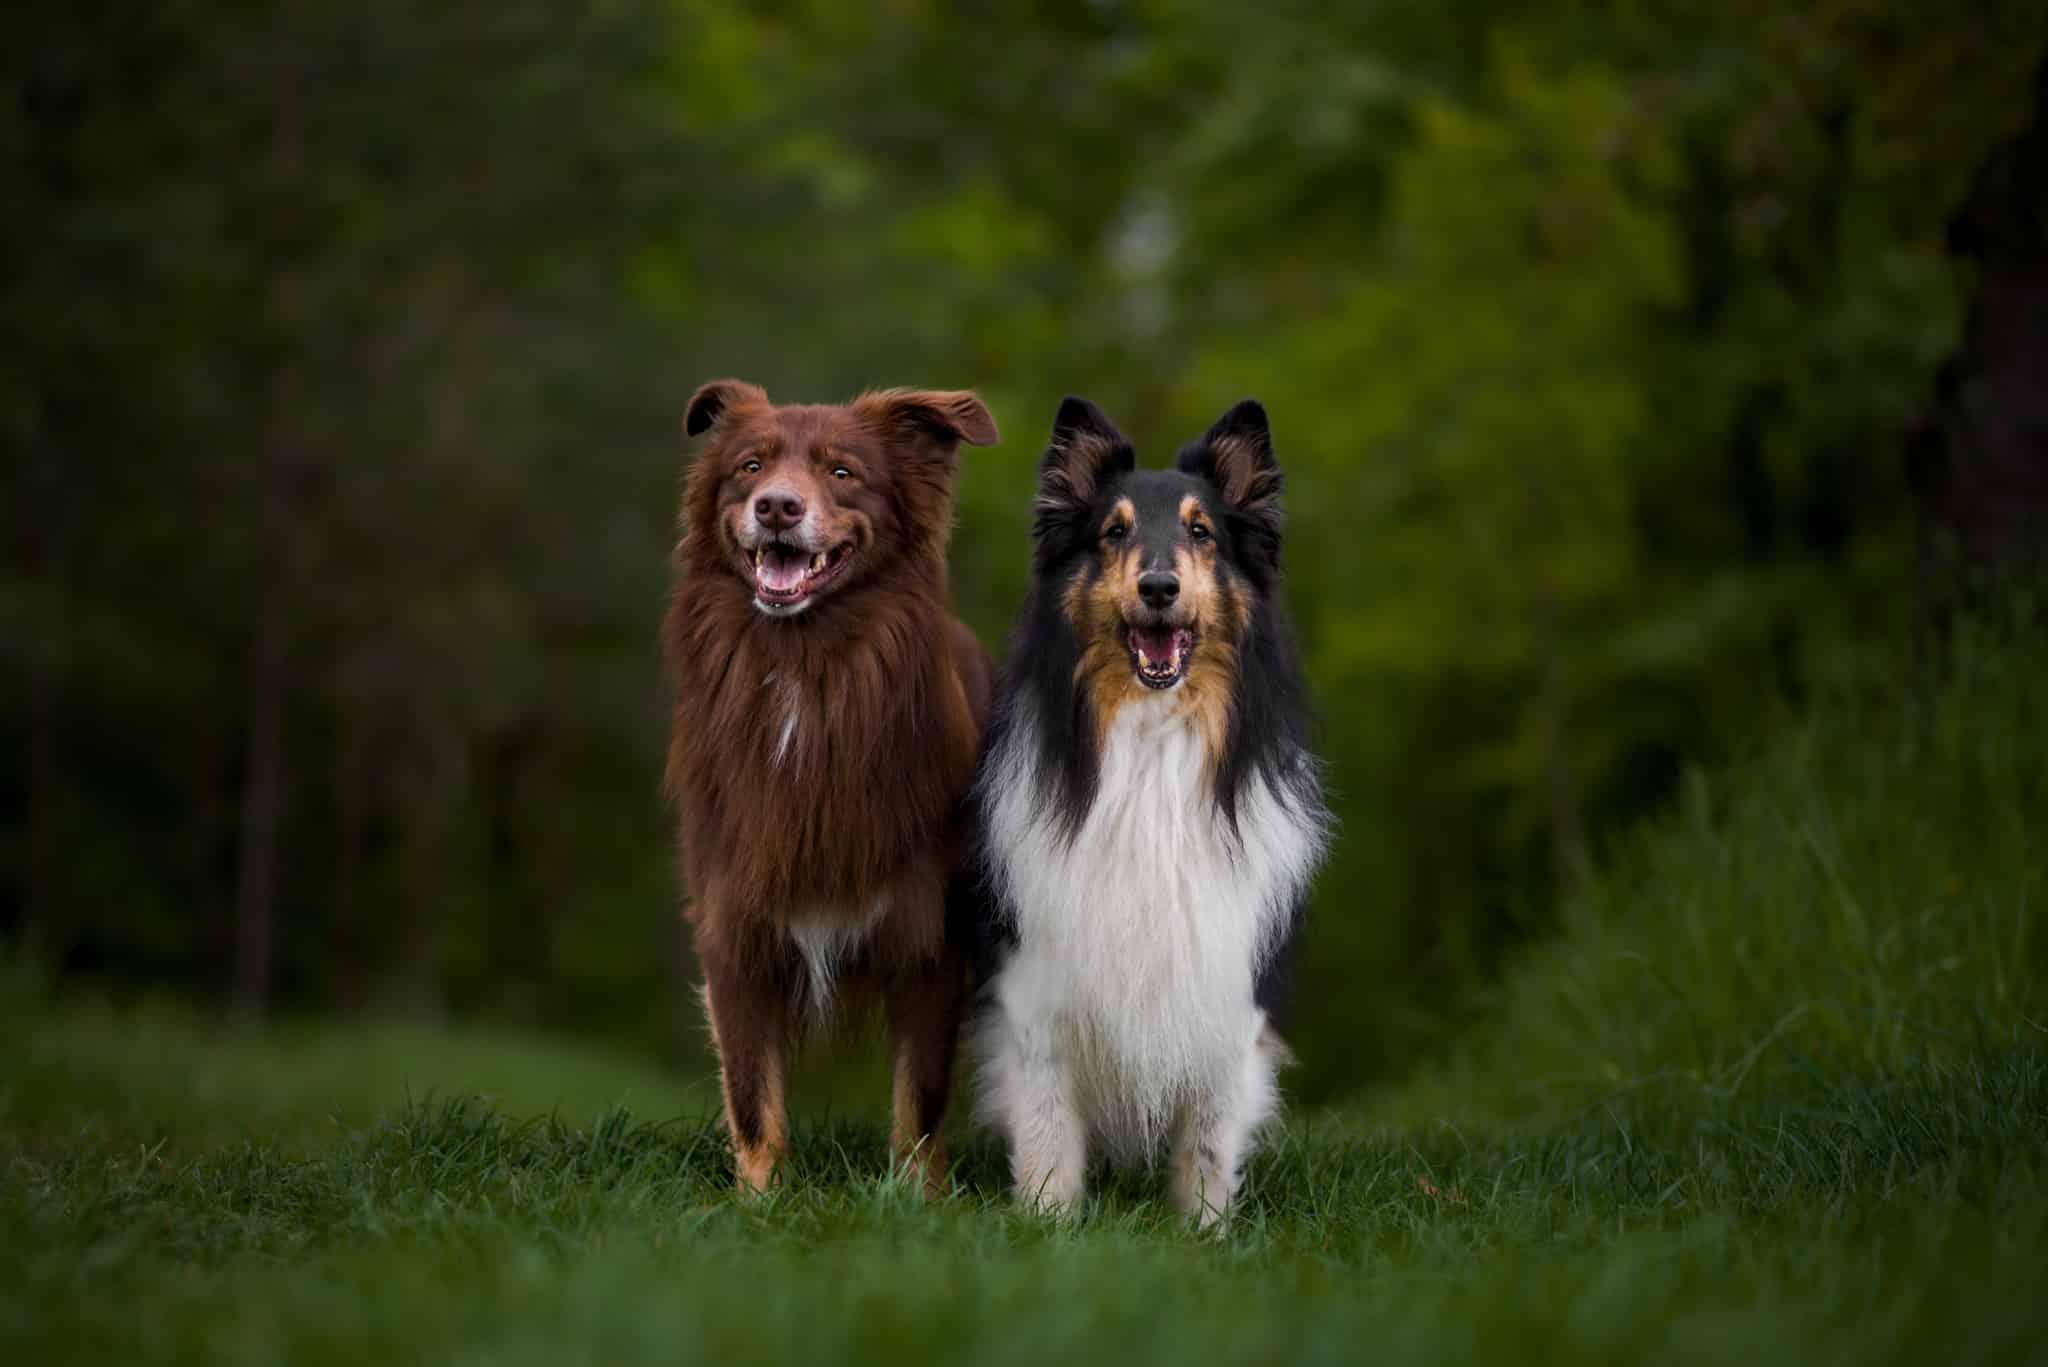 Míša Malá and Eliška Hrůzová agree that dog photography is not always easy